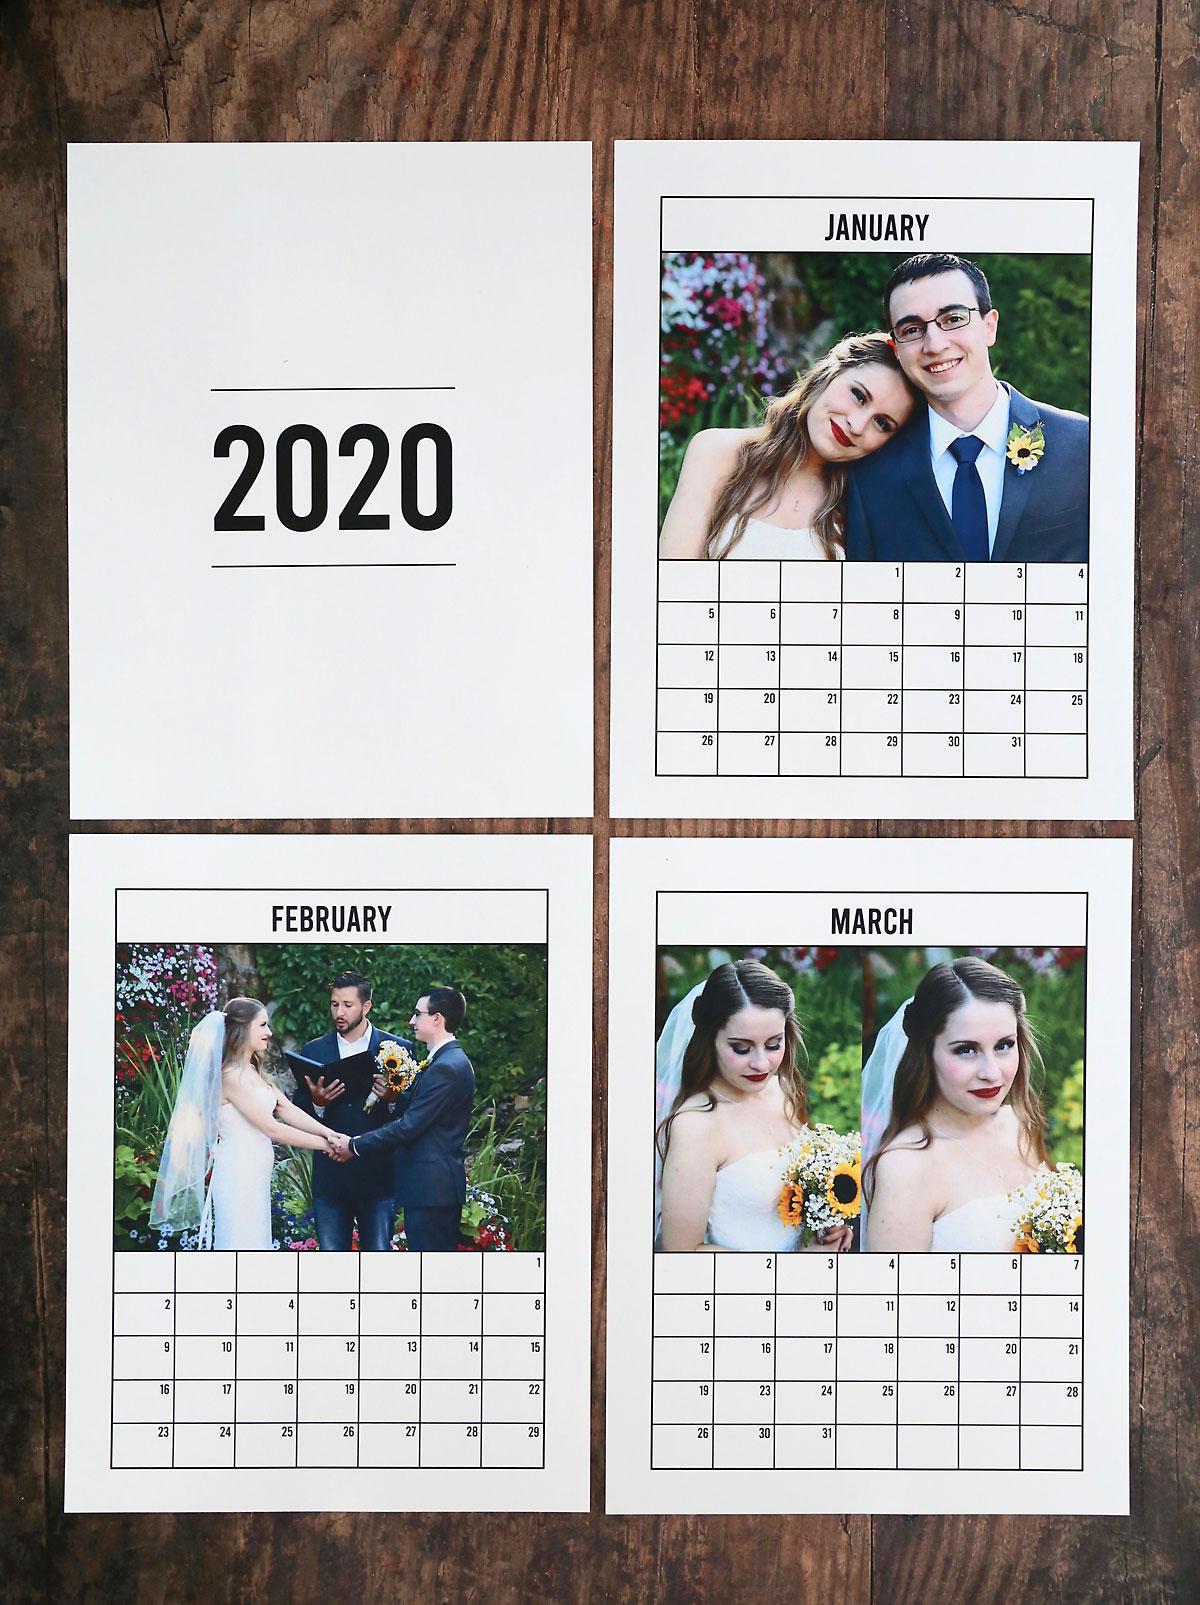 2020 photo calendar: Jan, Feb, and Mar